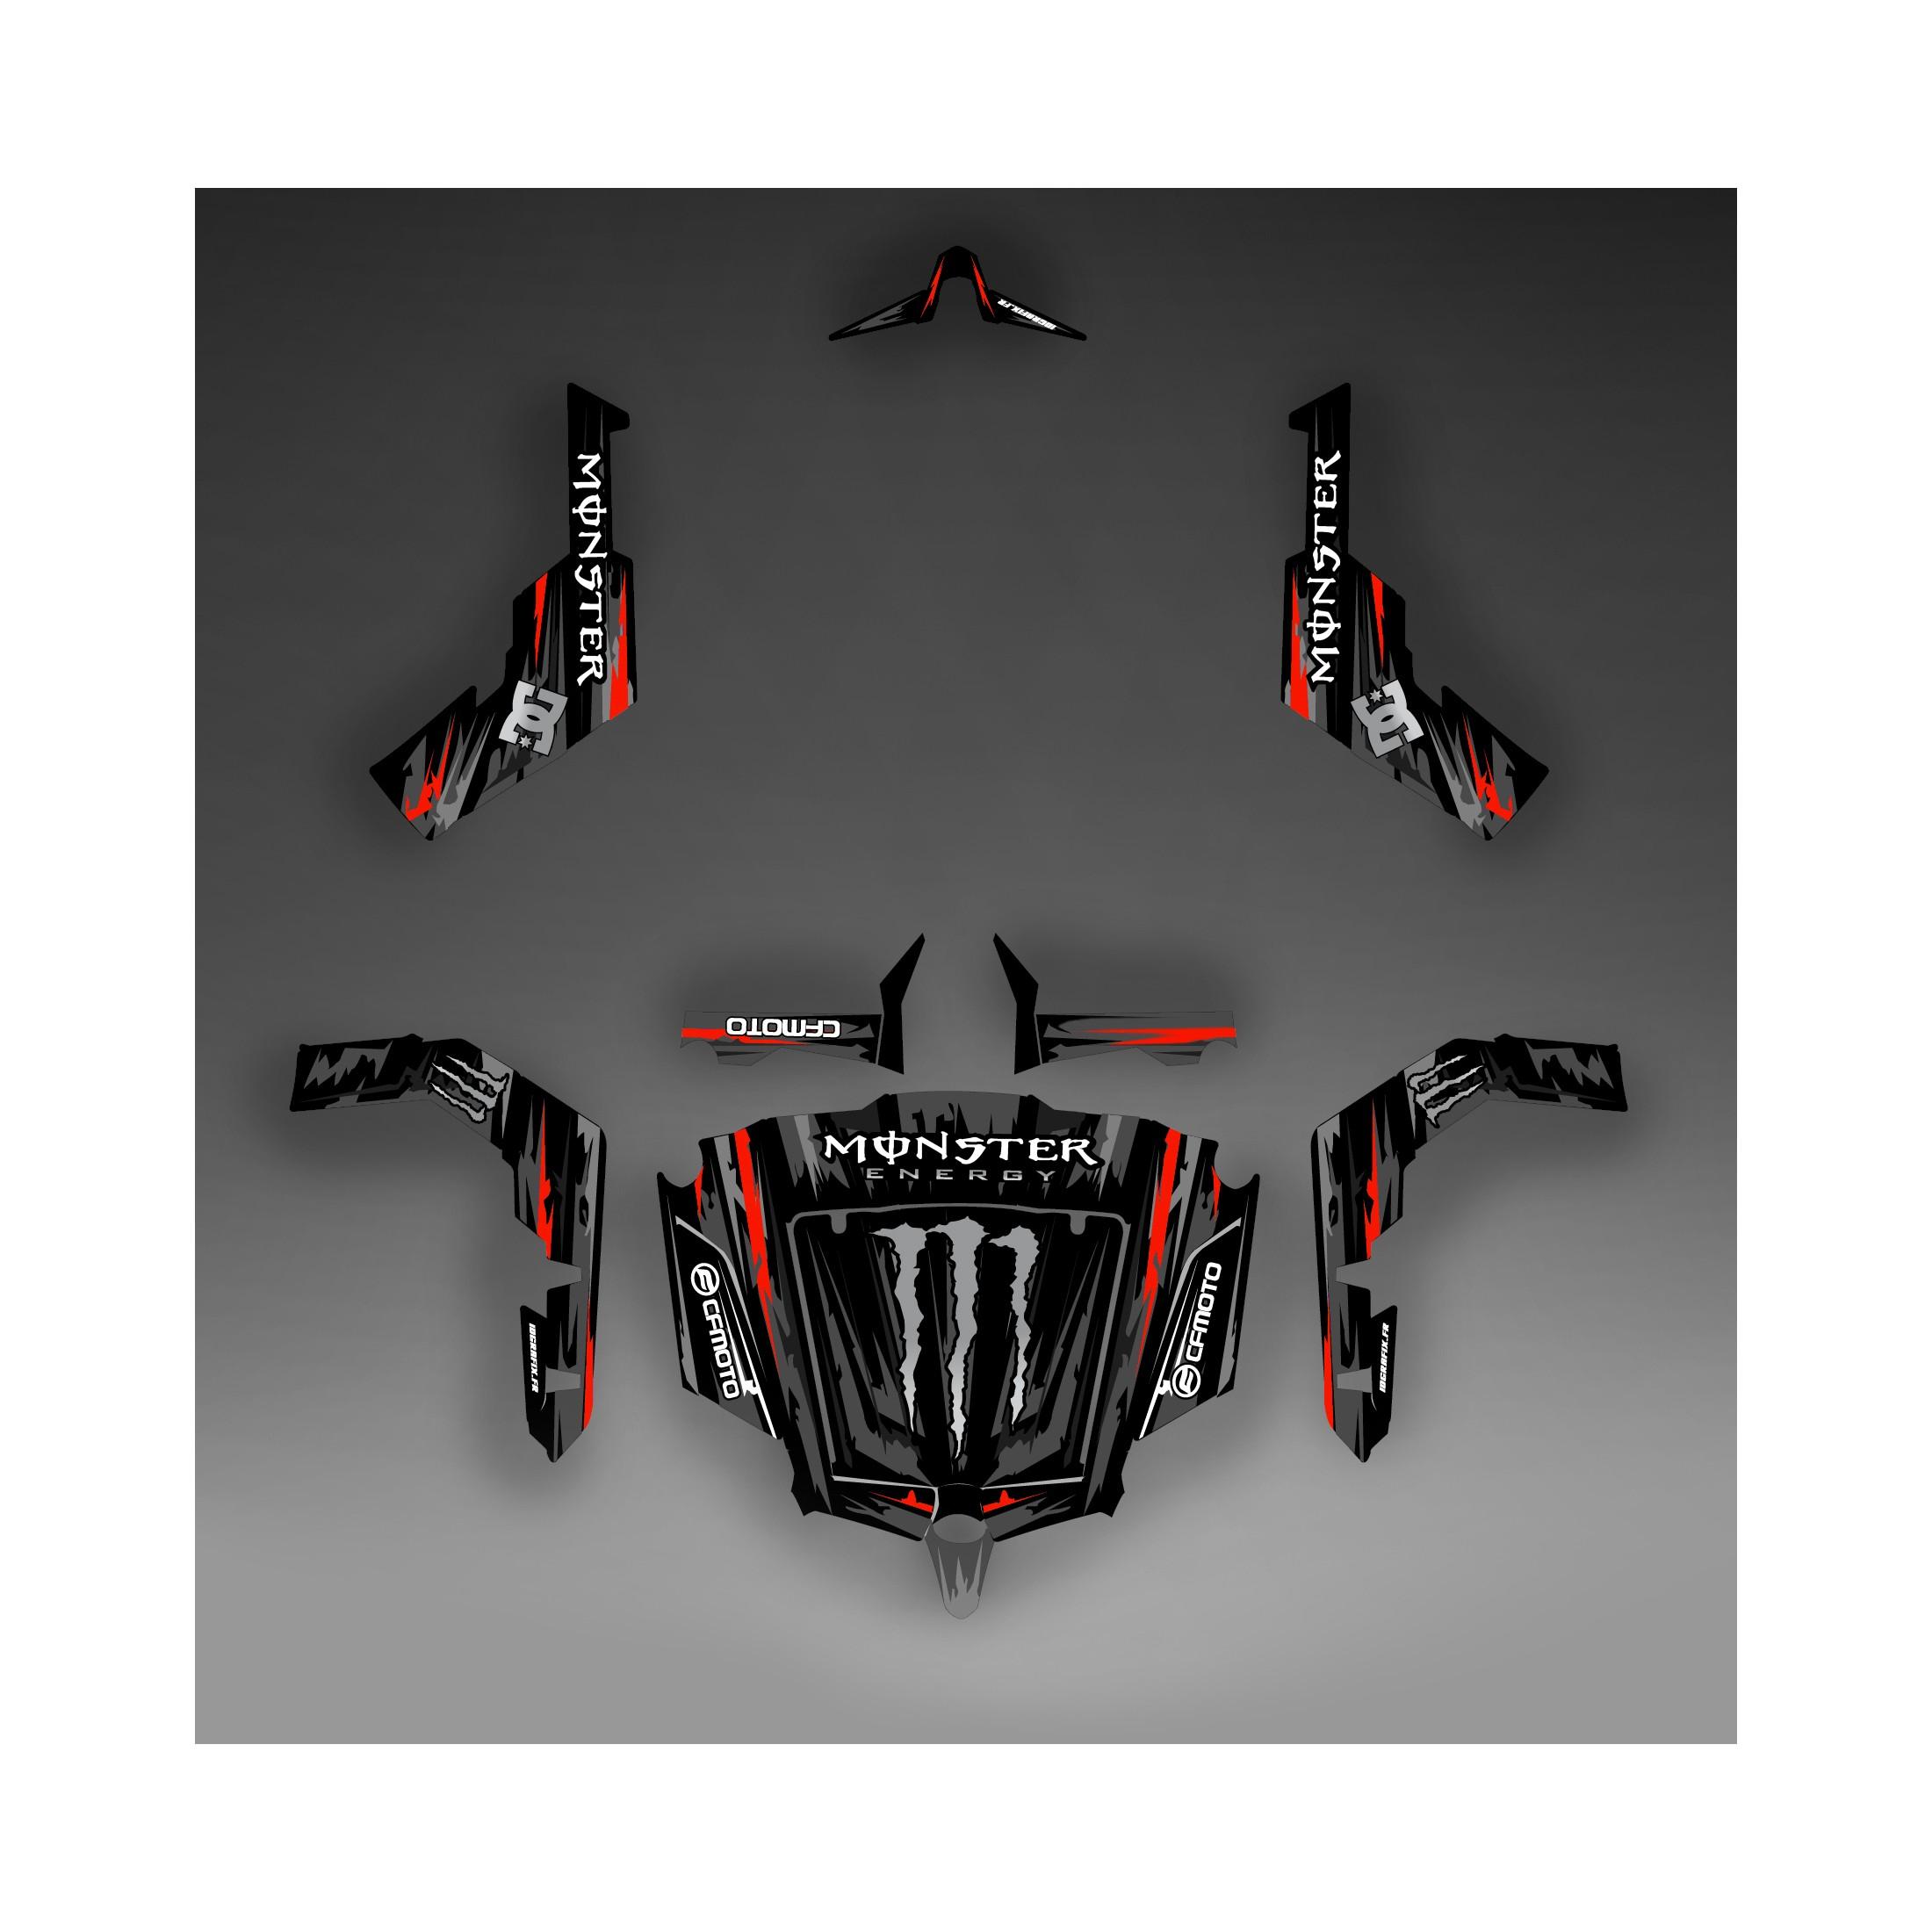 Kit d coration monster edition noir rouge idgrafix for Porte zforce 800